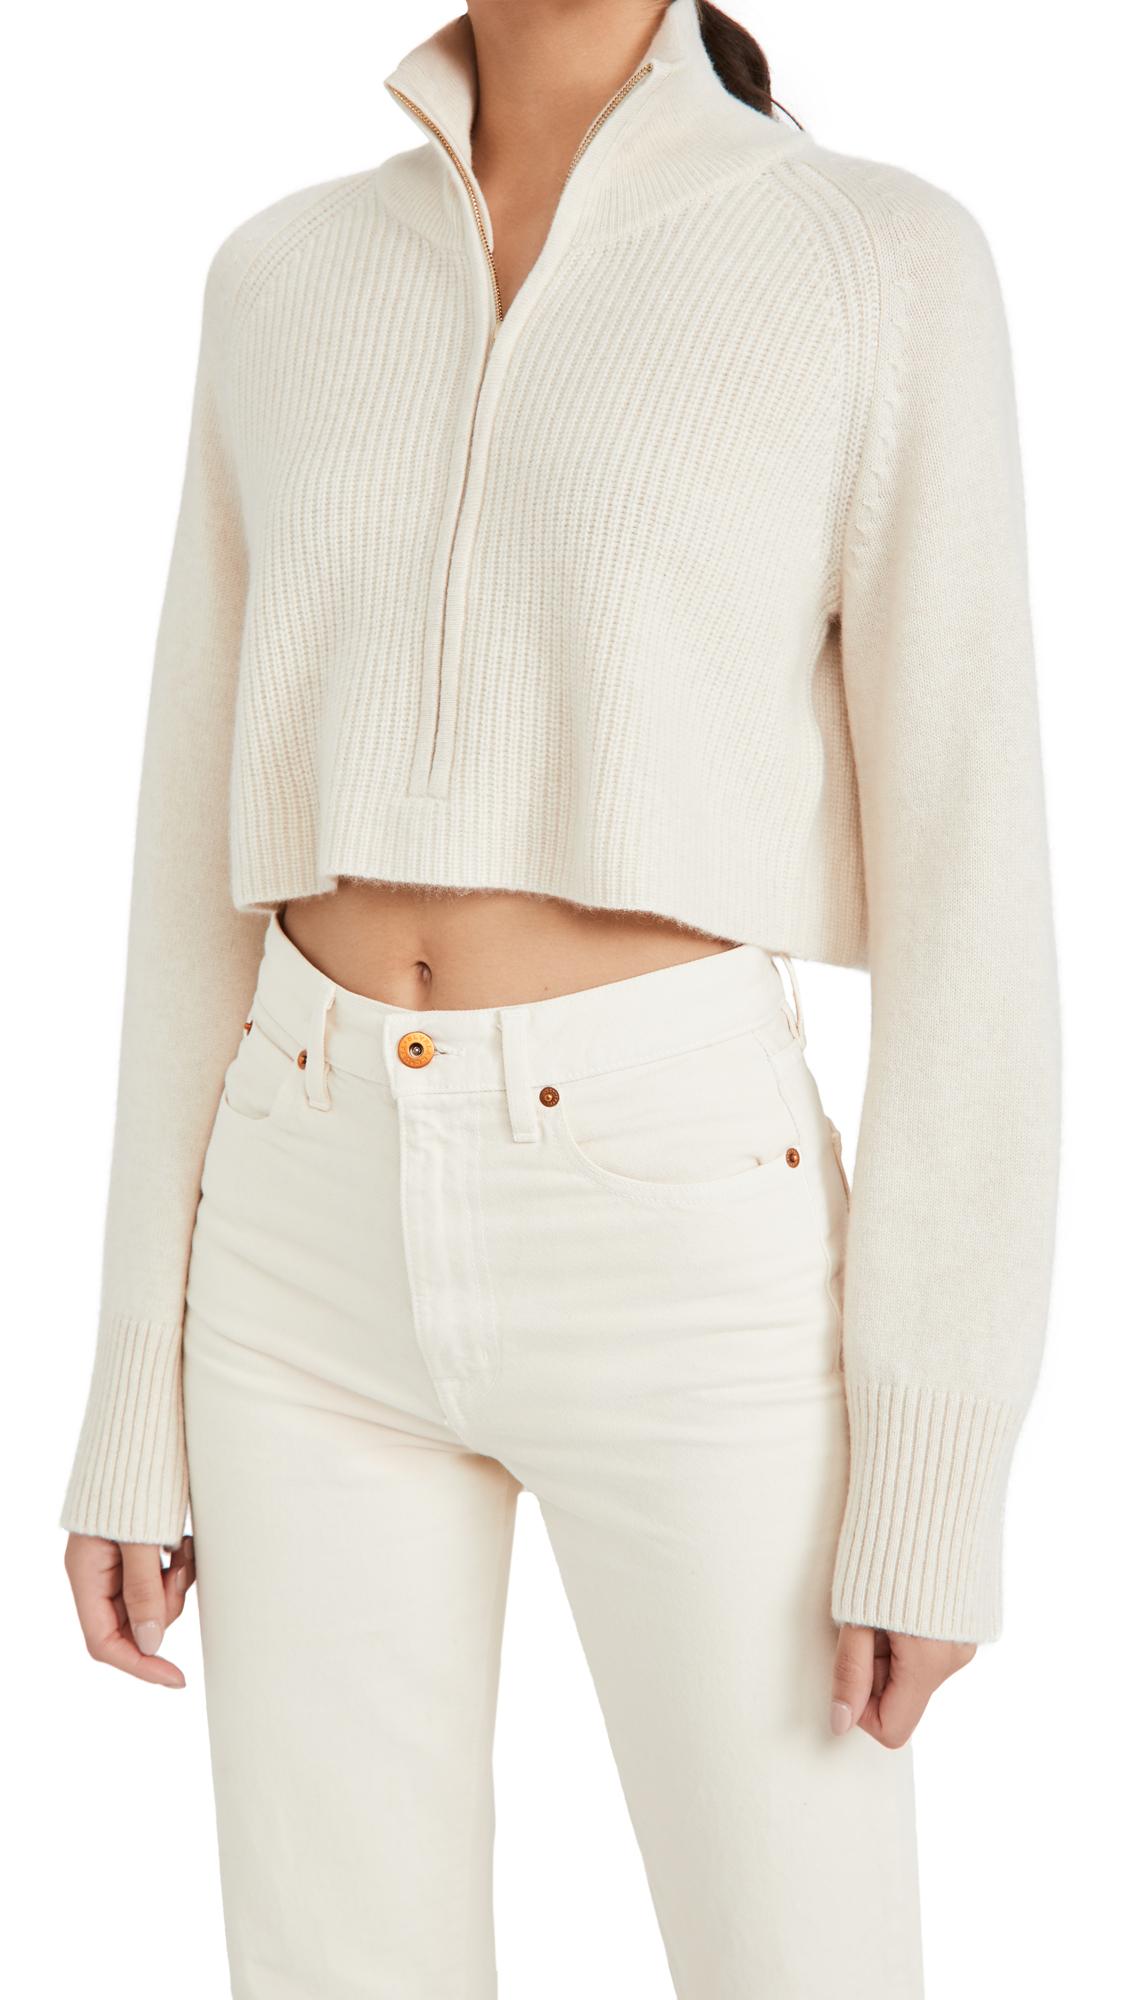 Sablyn Nash Sweater